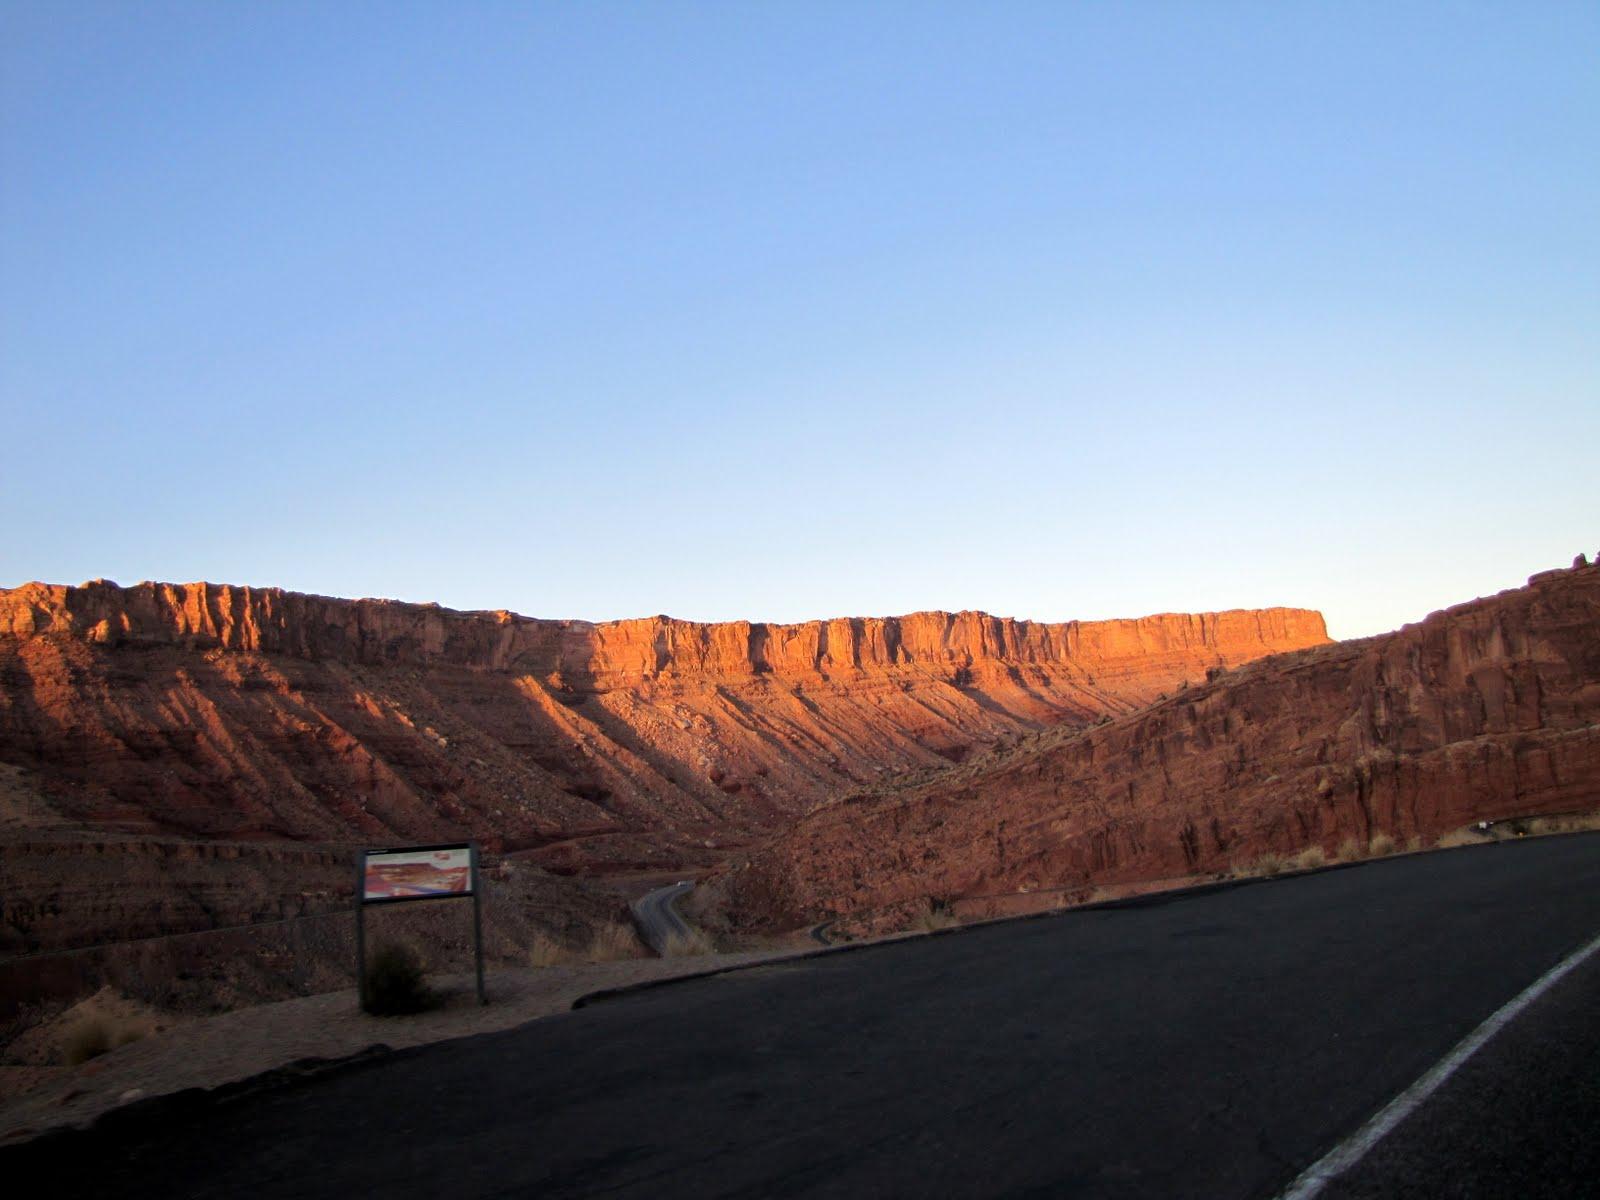 Sunrise at Arches National Park's Entrance